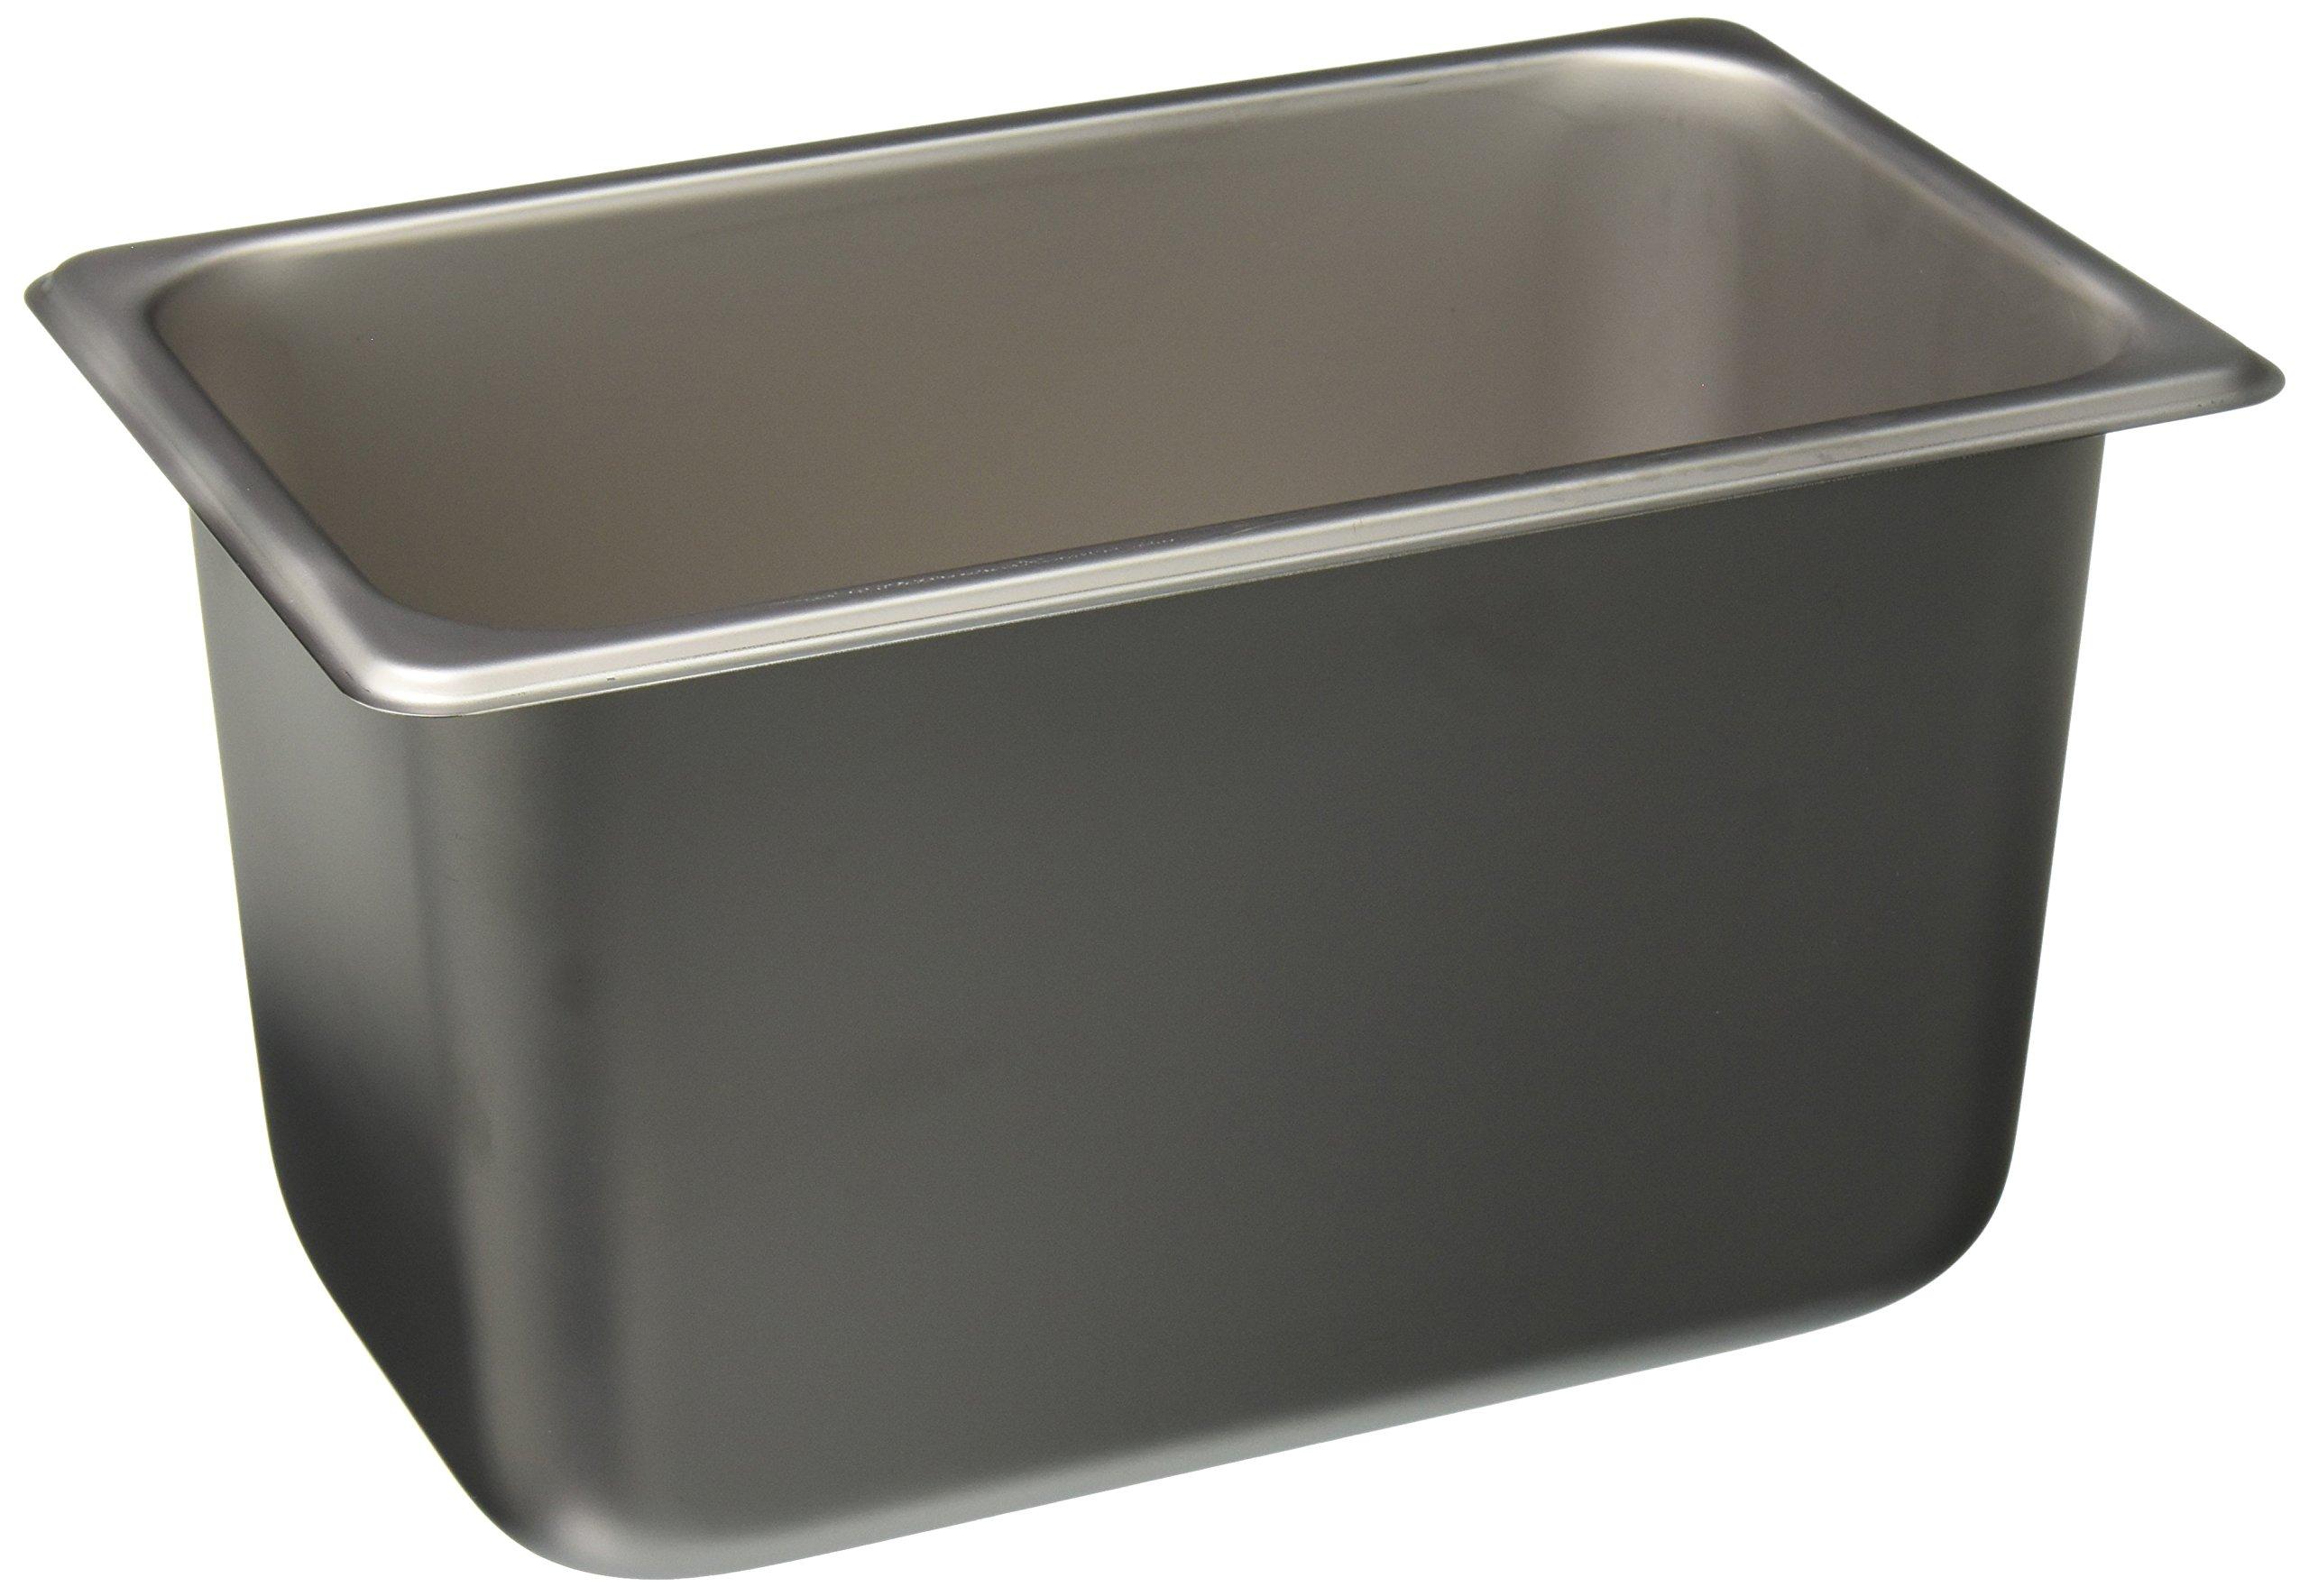 Winco SPQ6 1/4 Size Pan, 6-Inch